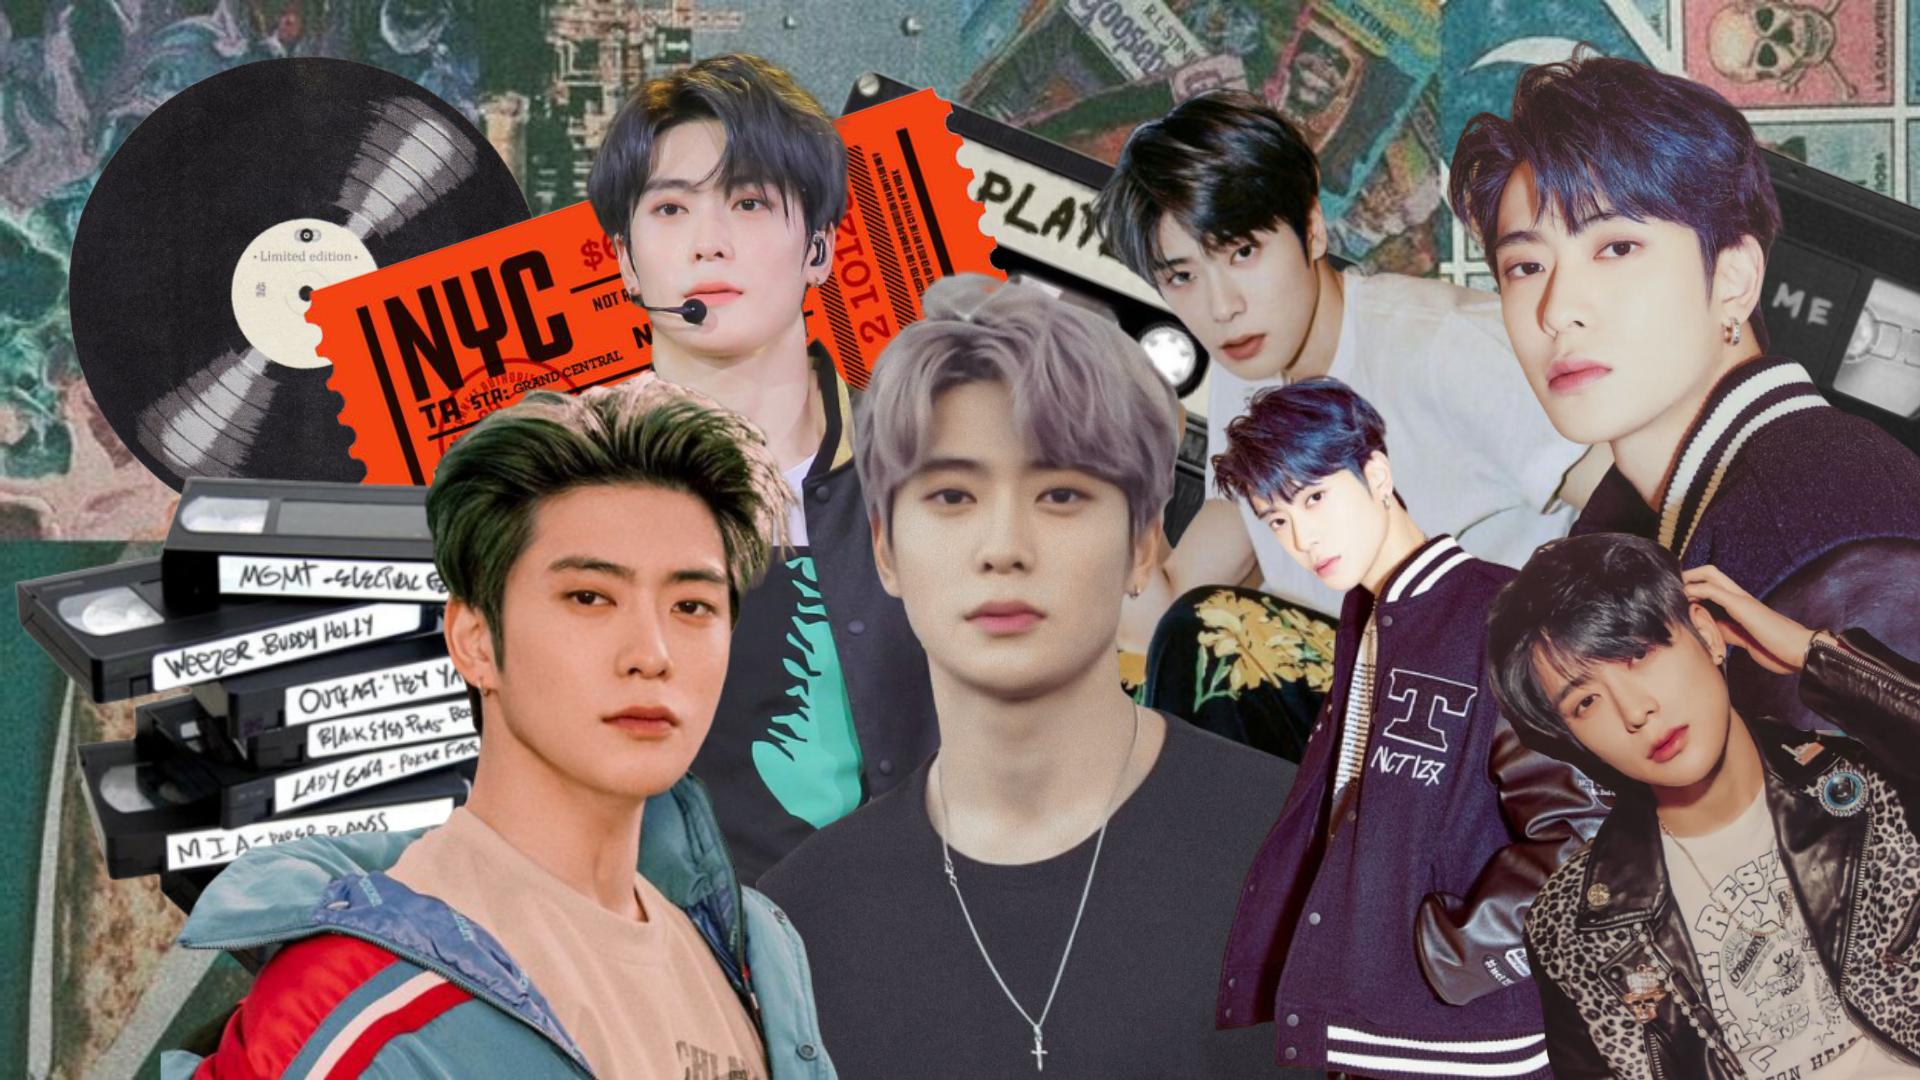 Jung Jaehyun Desktop Wallpaper Wallpaper Dekstop Destop Wallpaper Jaehyun Nct